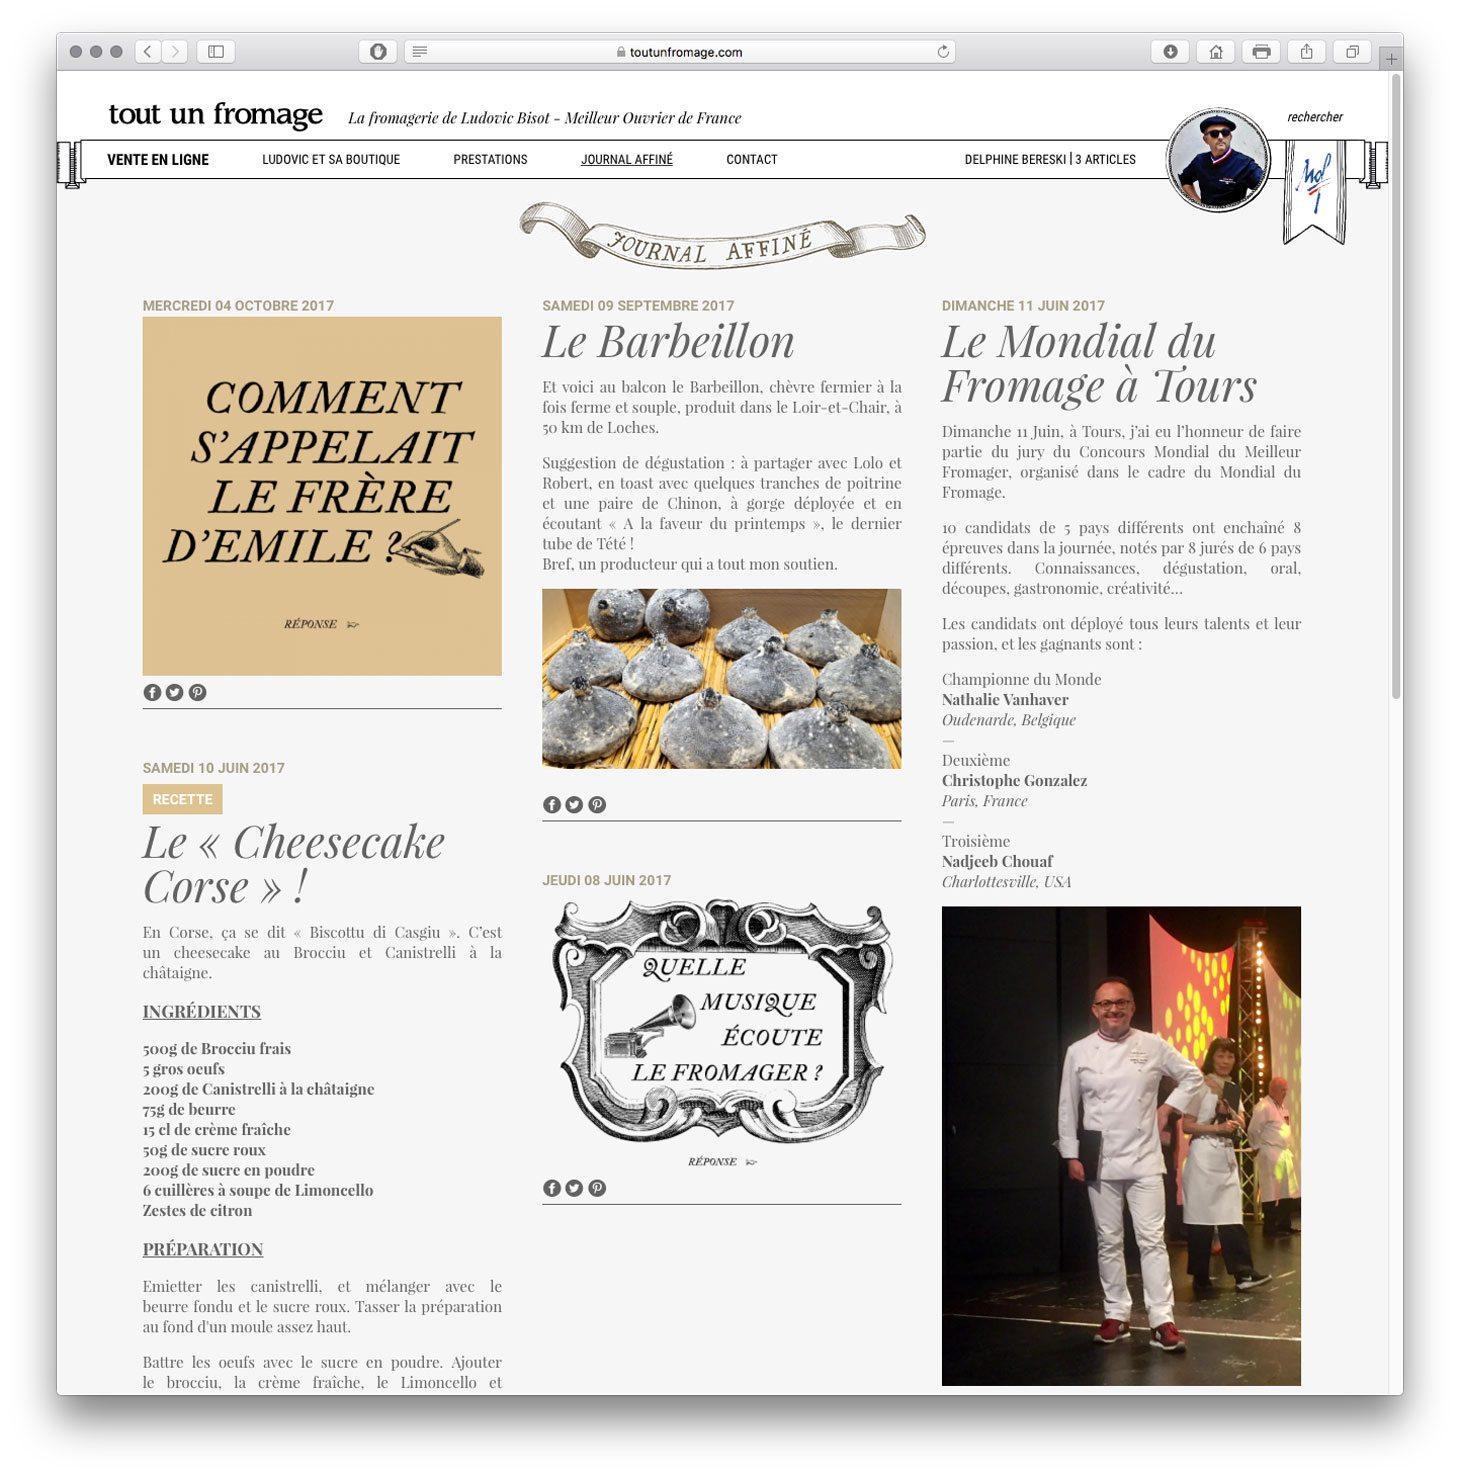 tout un fromage blog journal affiné ludovic bisot